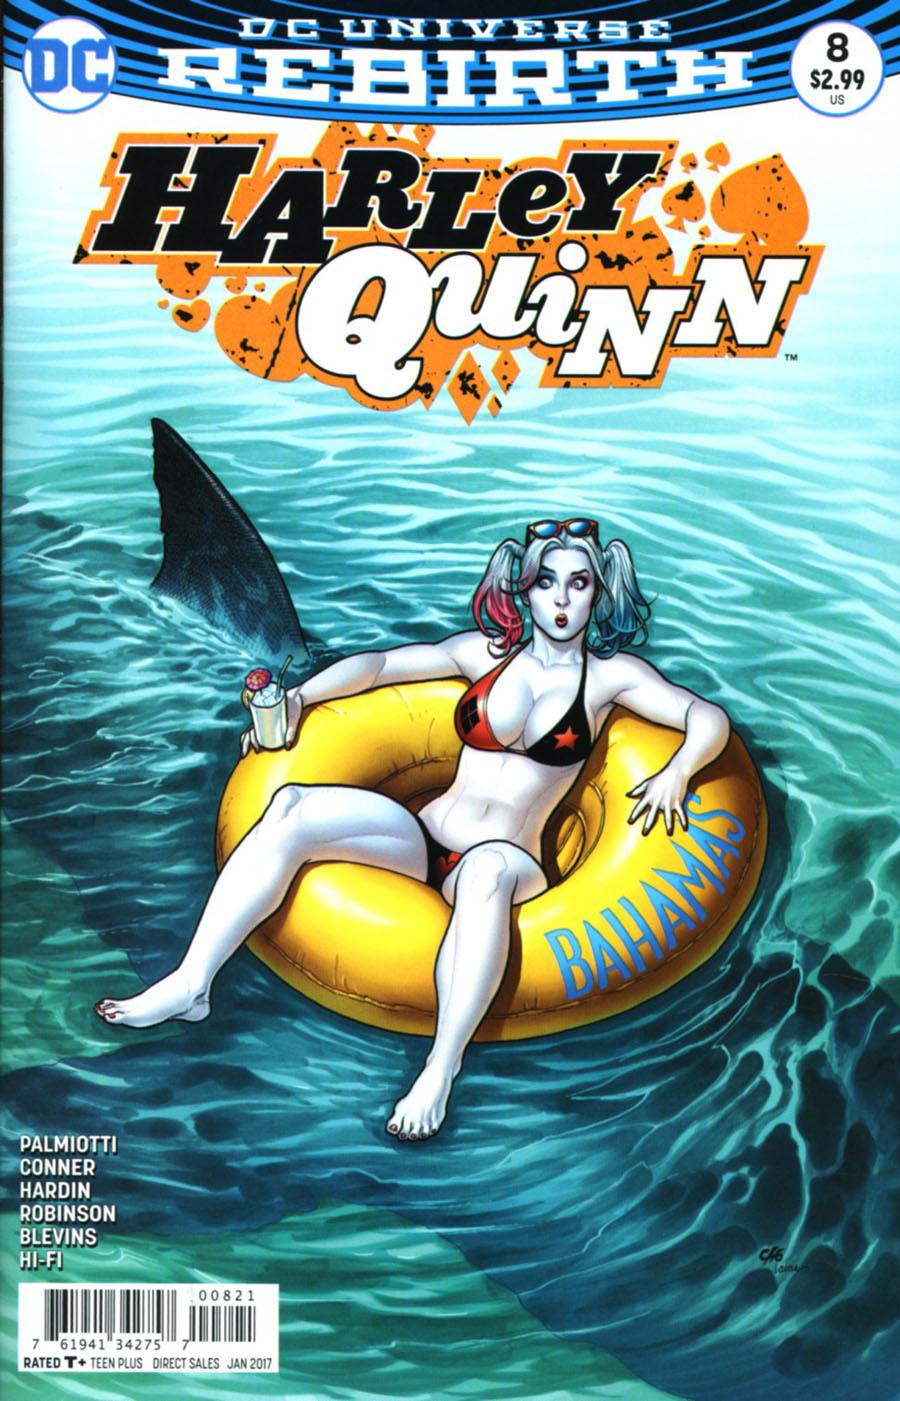 Harley Quinn Vol 3 #8 Cover B Variant Frank Cho Cover